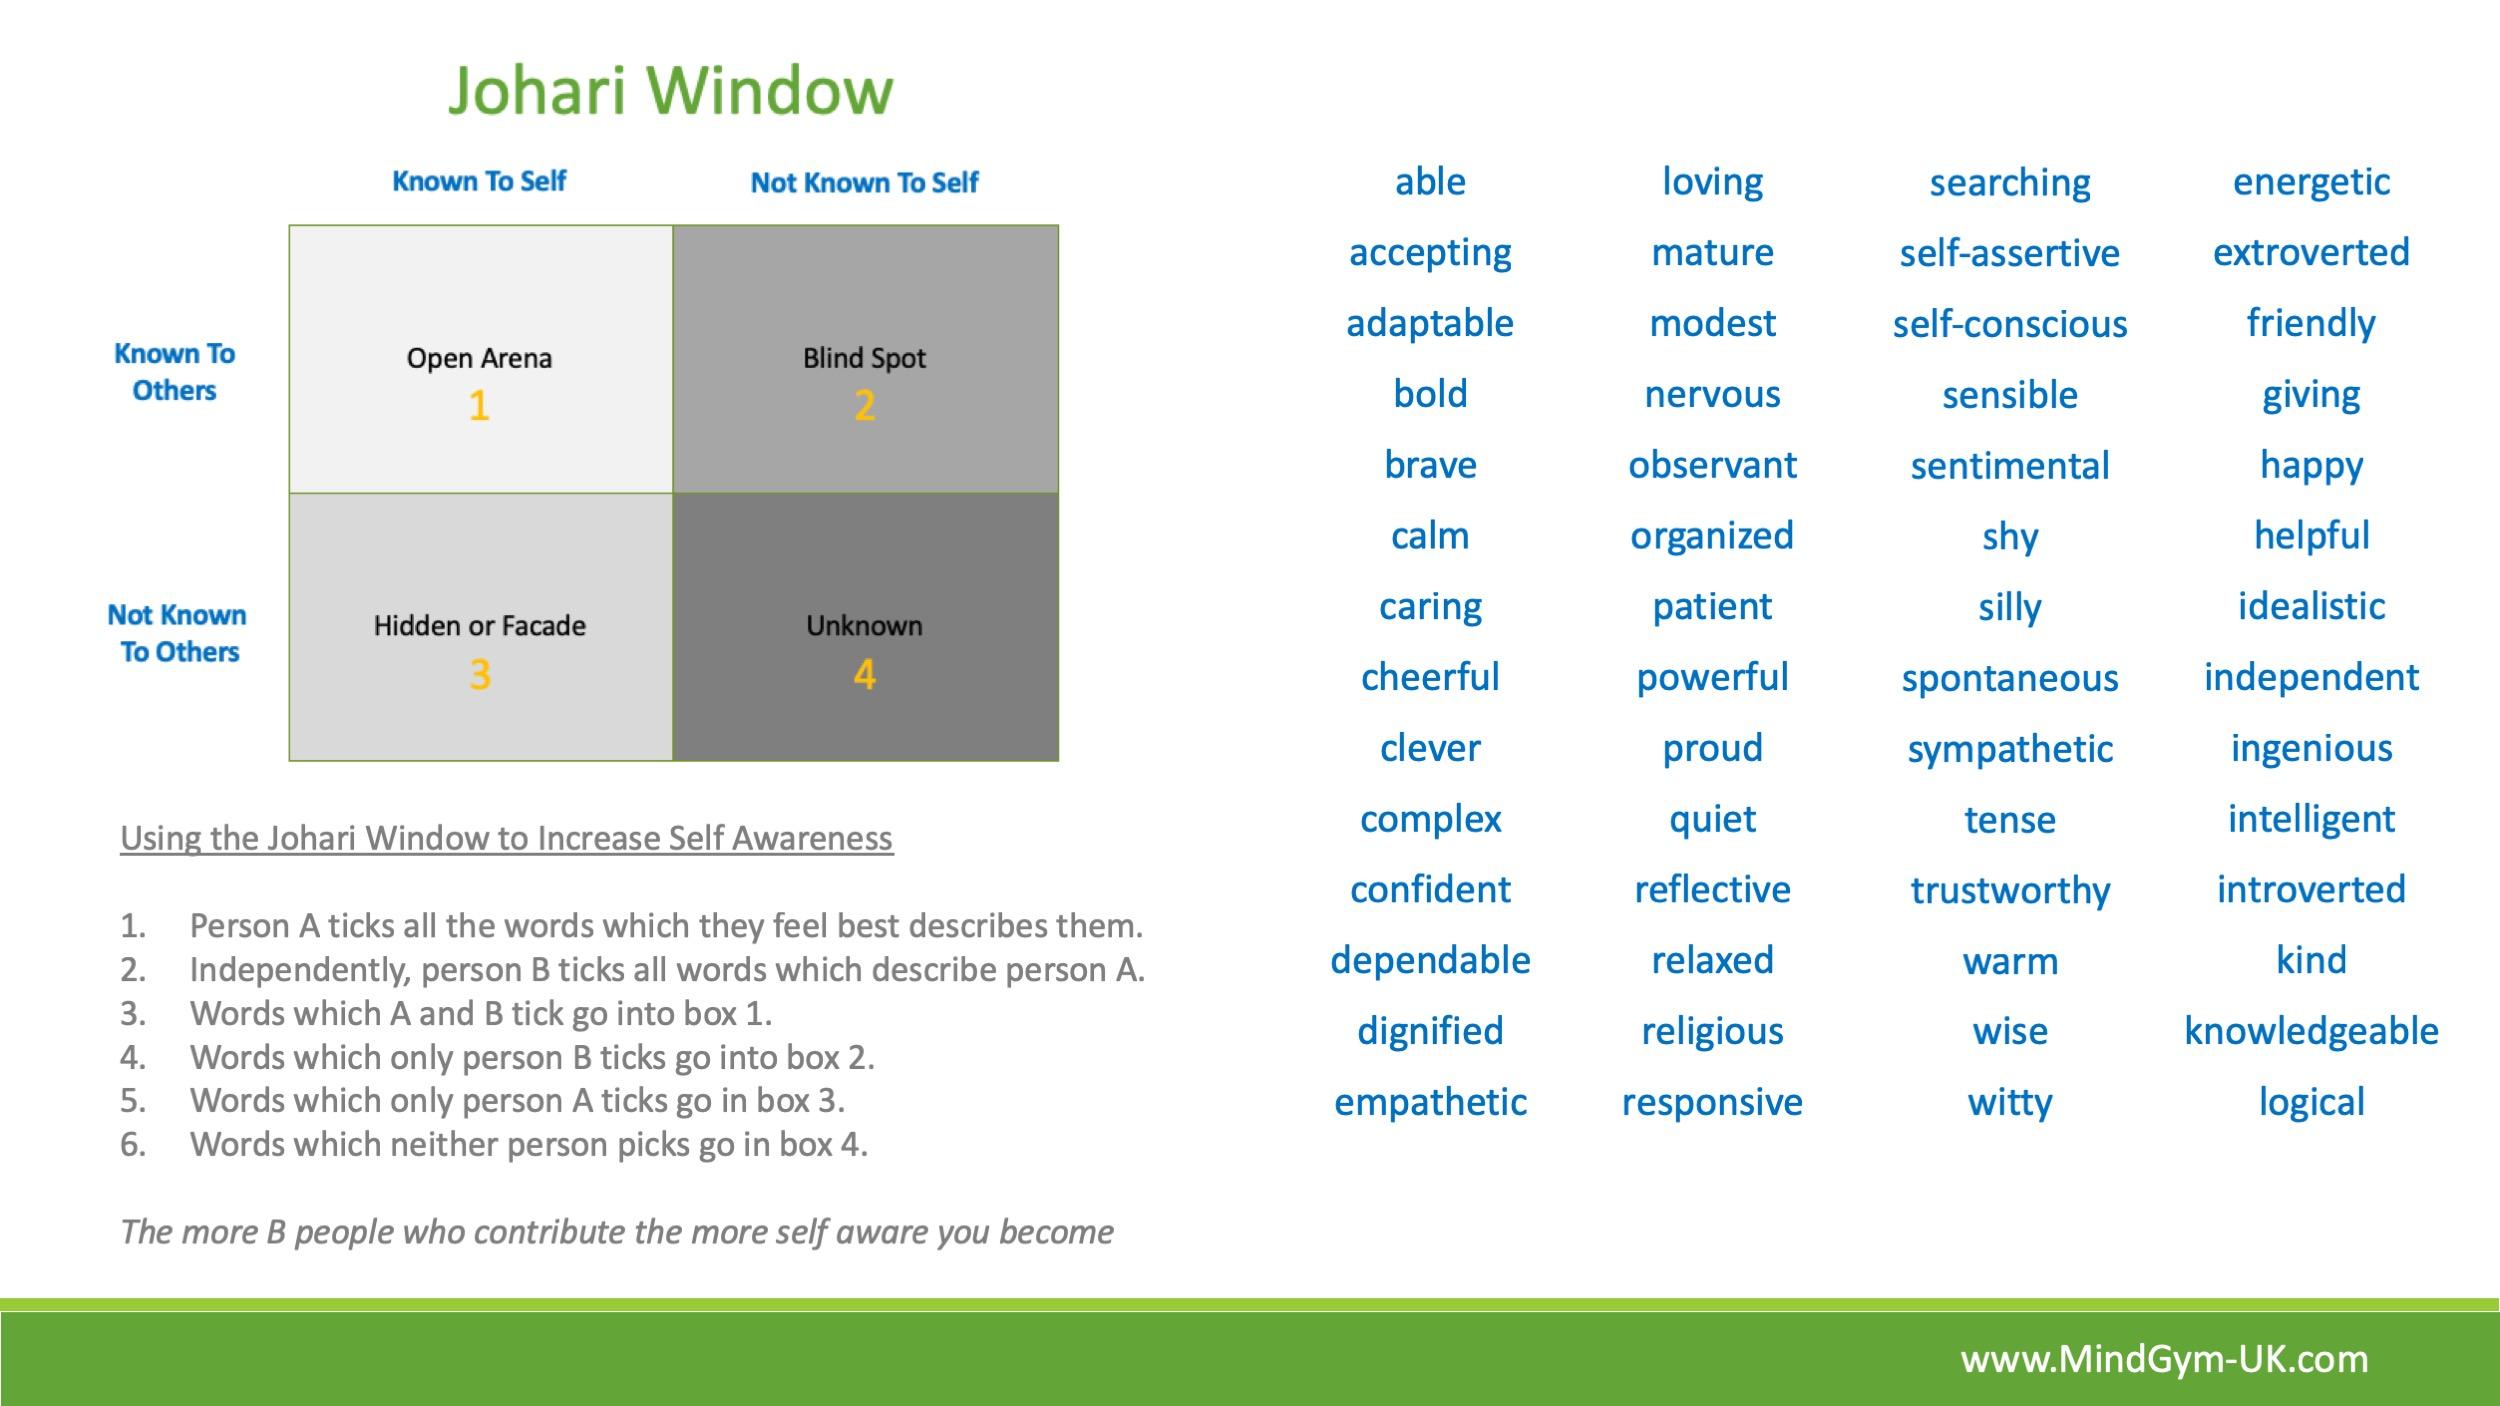 Mind Gym. Johari Window